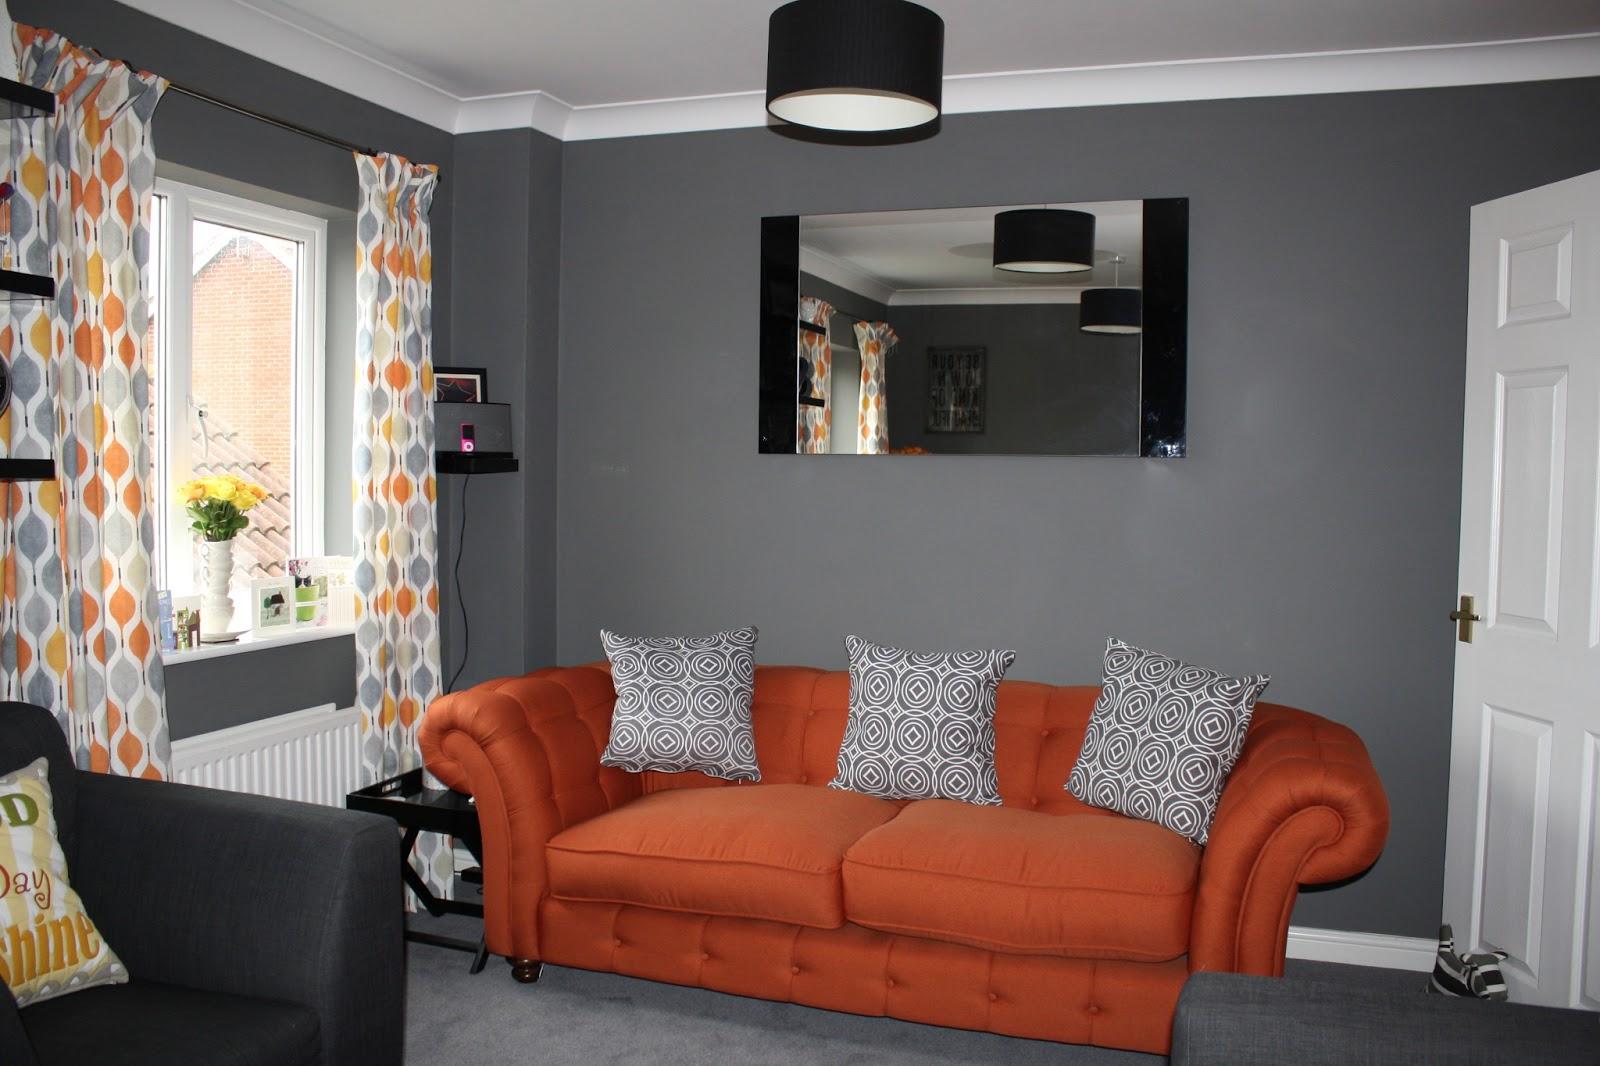 wonderful orange grey living room ideas | Orange And Grey Living Room Ideas - Zion Star